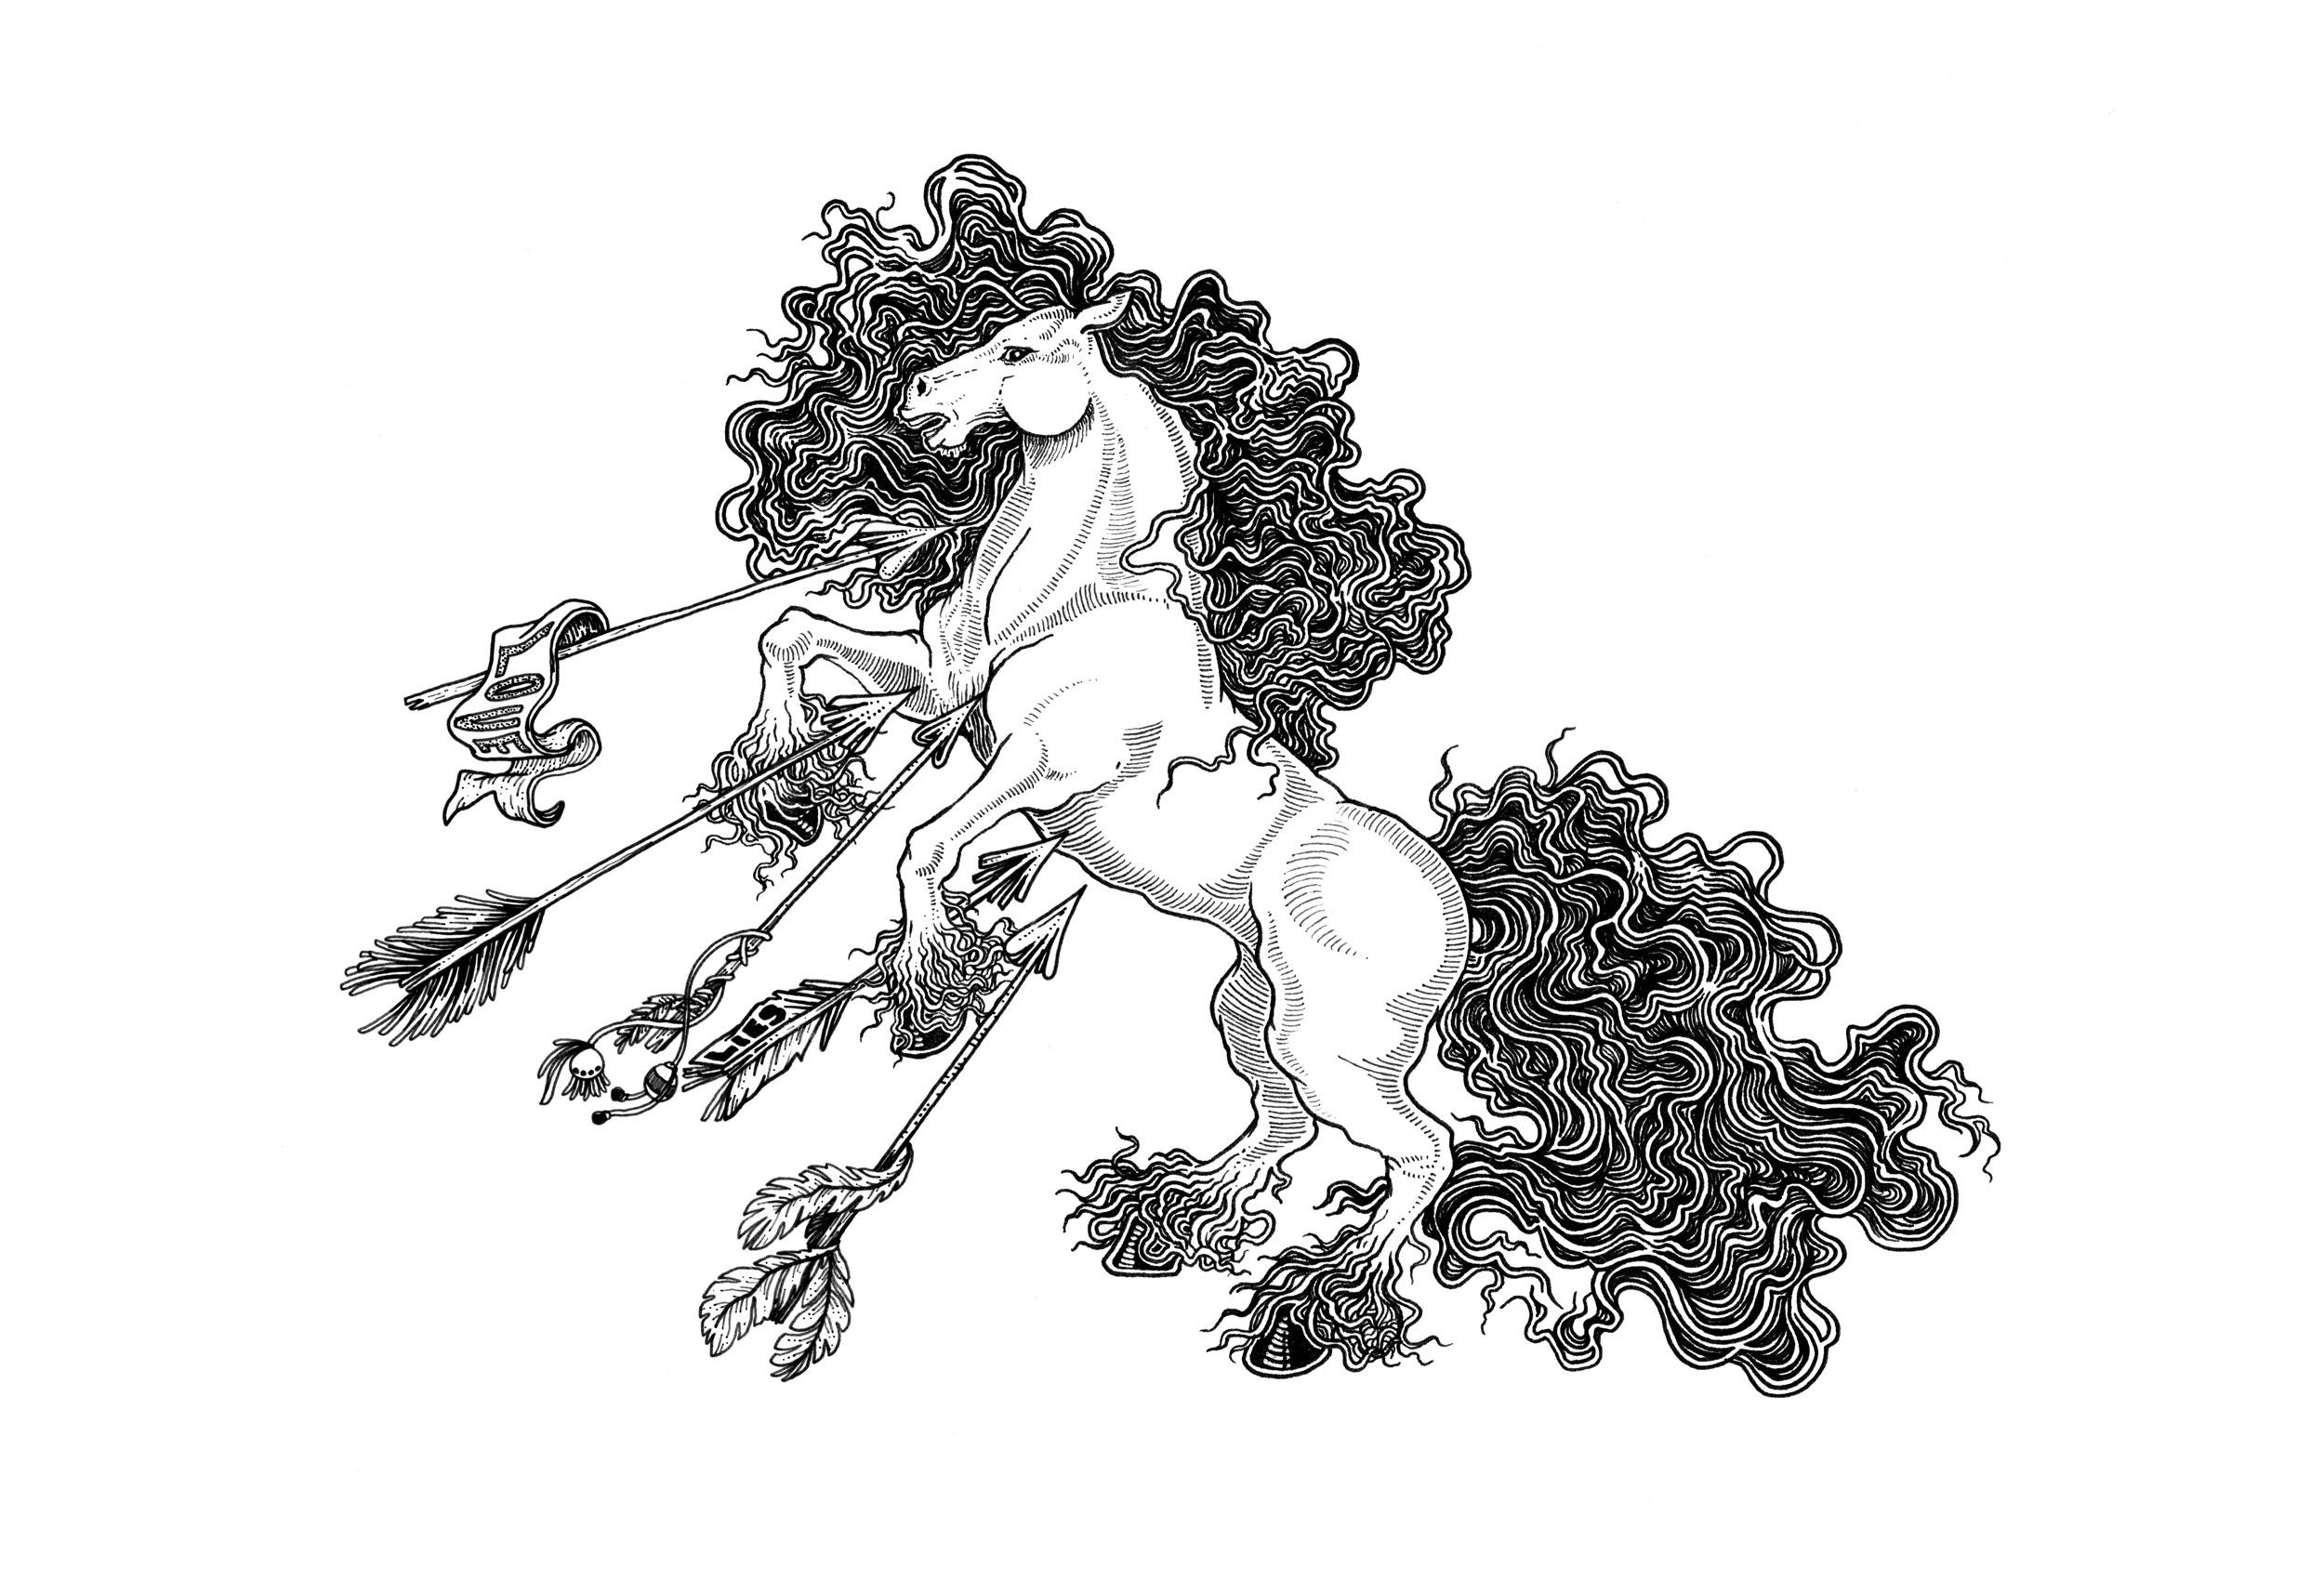 The_Horse_02-web.jpg